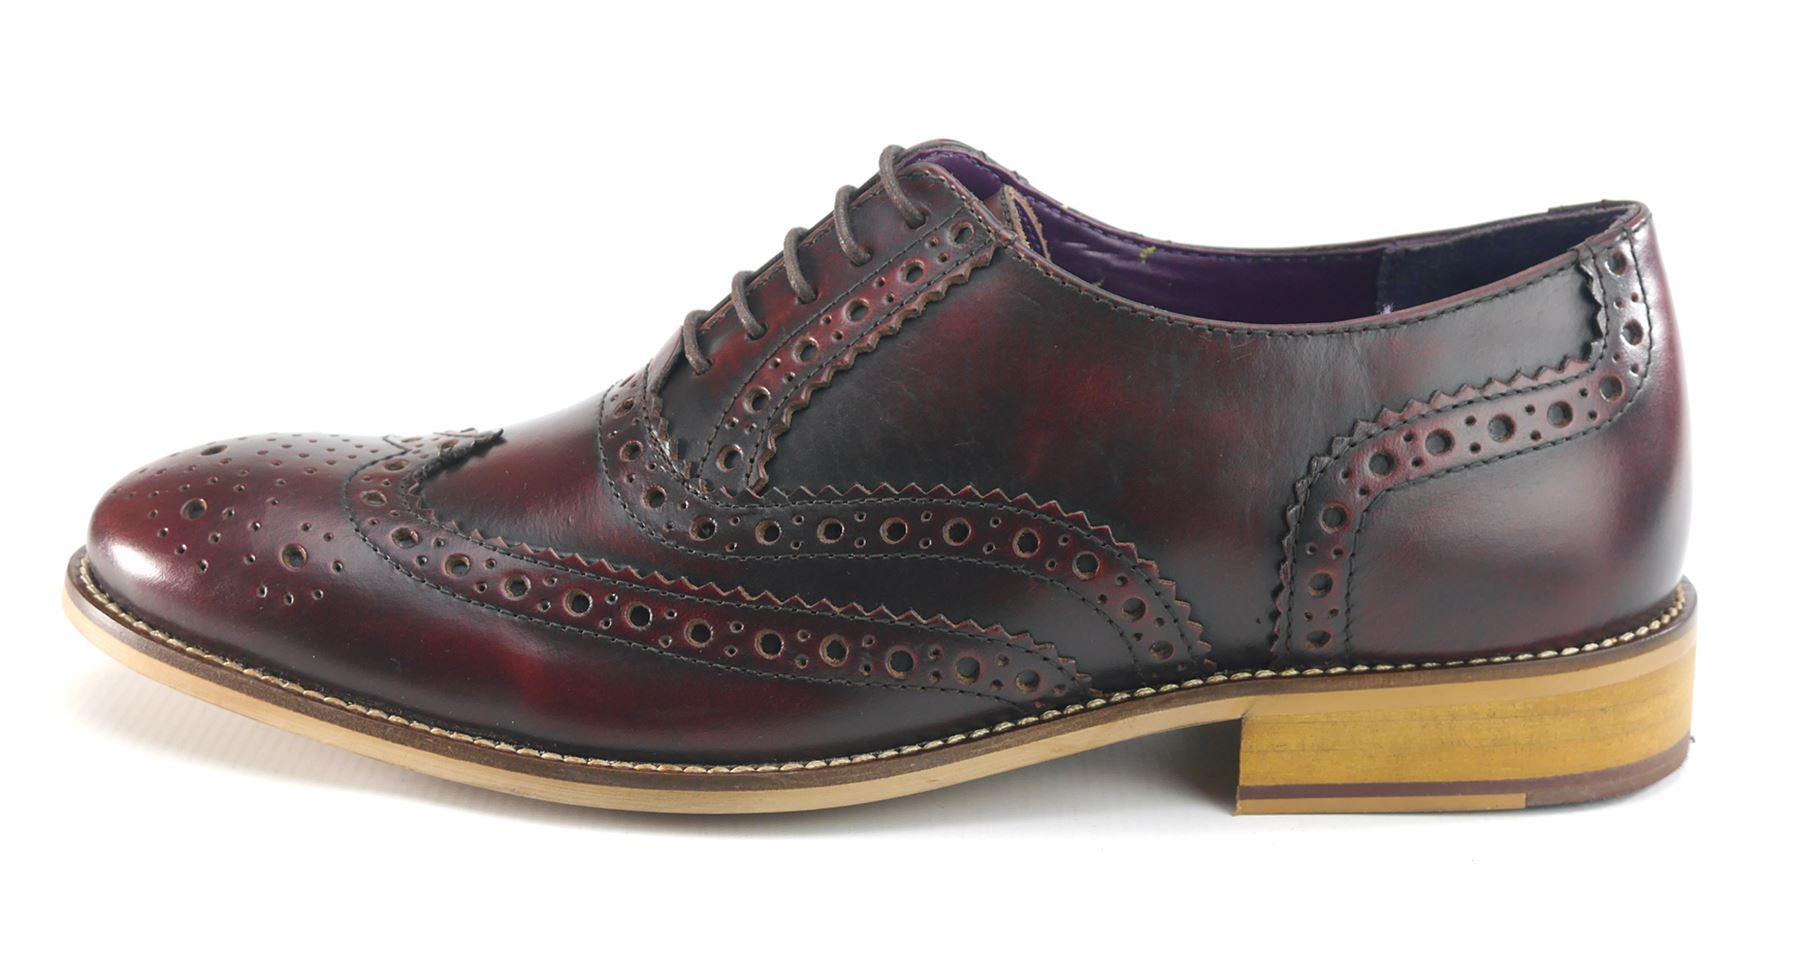 Frank James ROTford Leder Wedding Lace Up Herren Fashion Brogues   Herren Up Schuhes 138b67